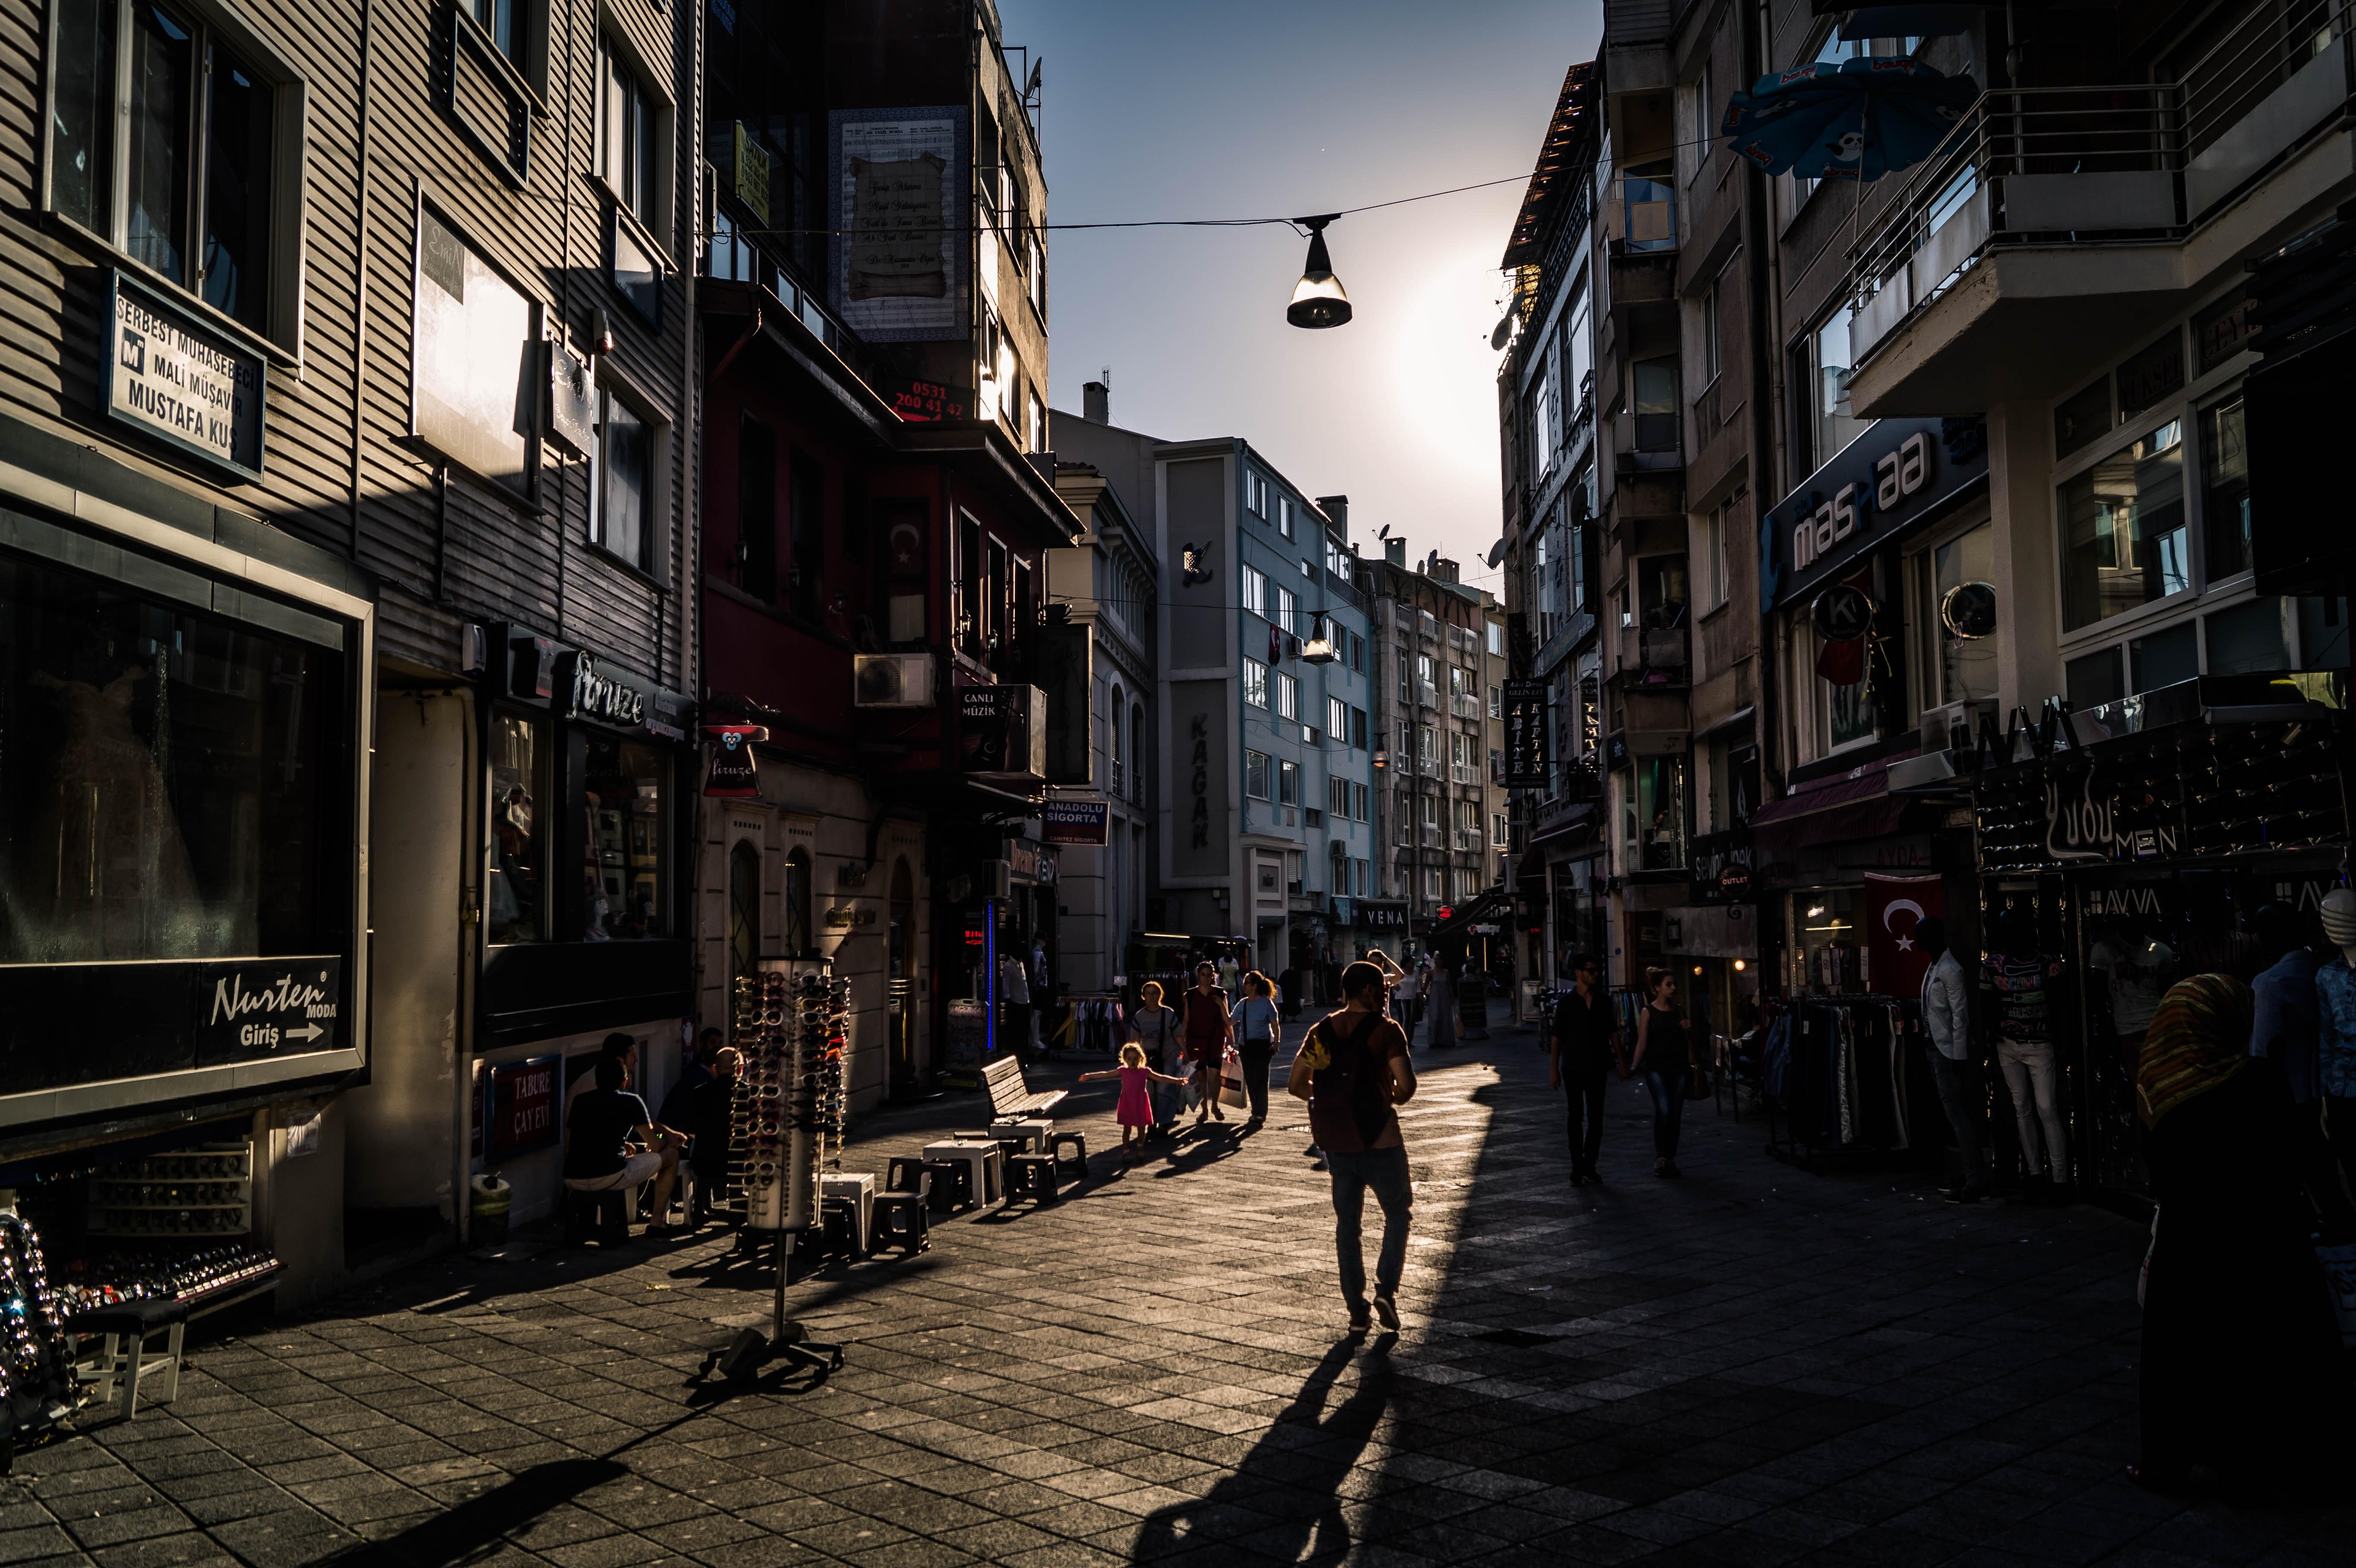 People walking on street between high rise building photo